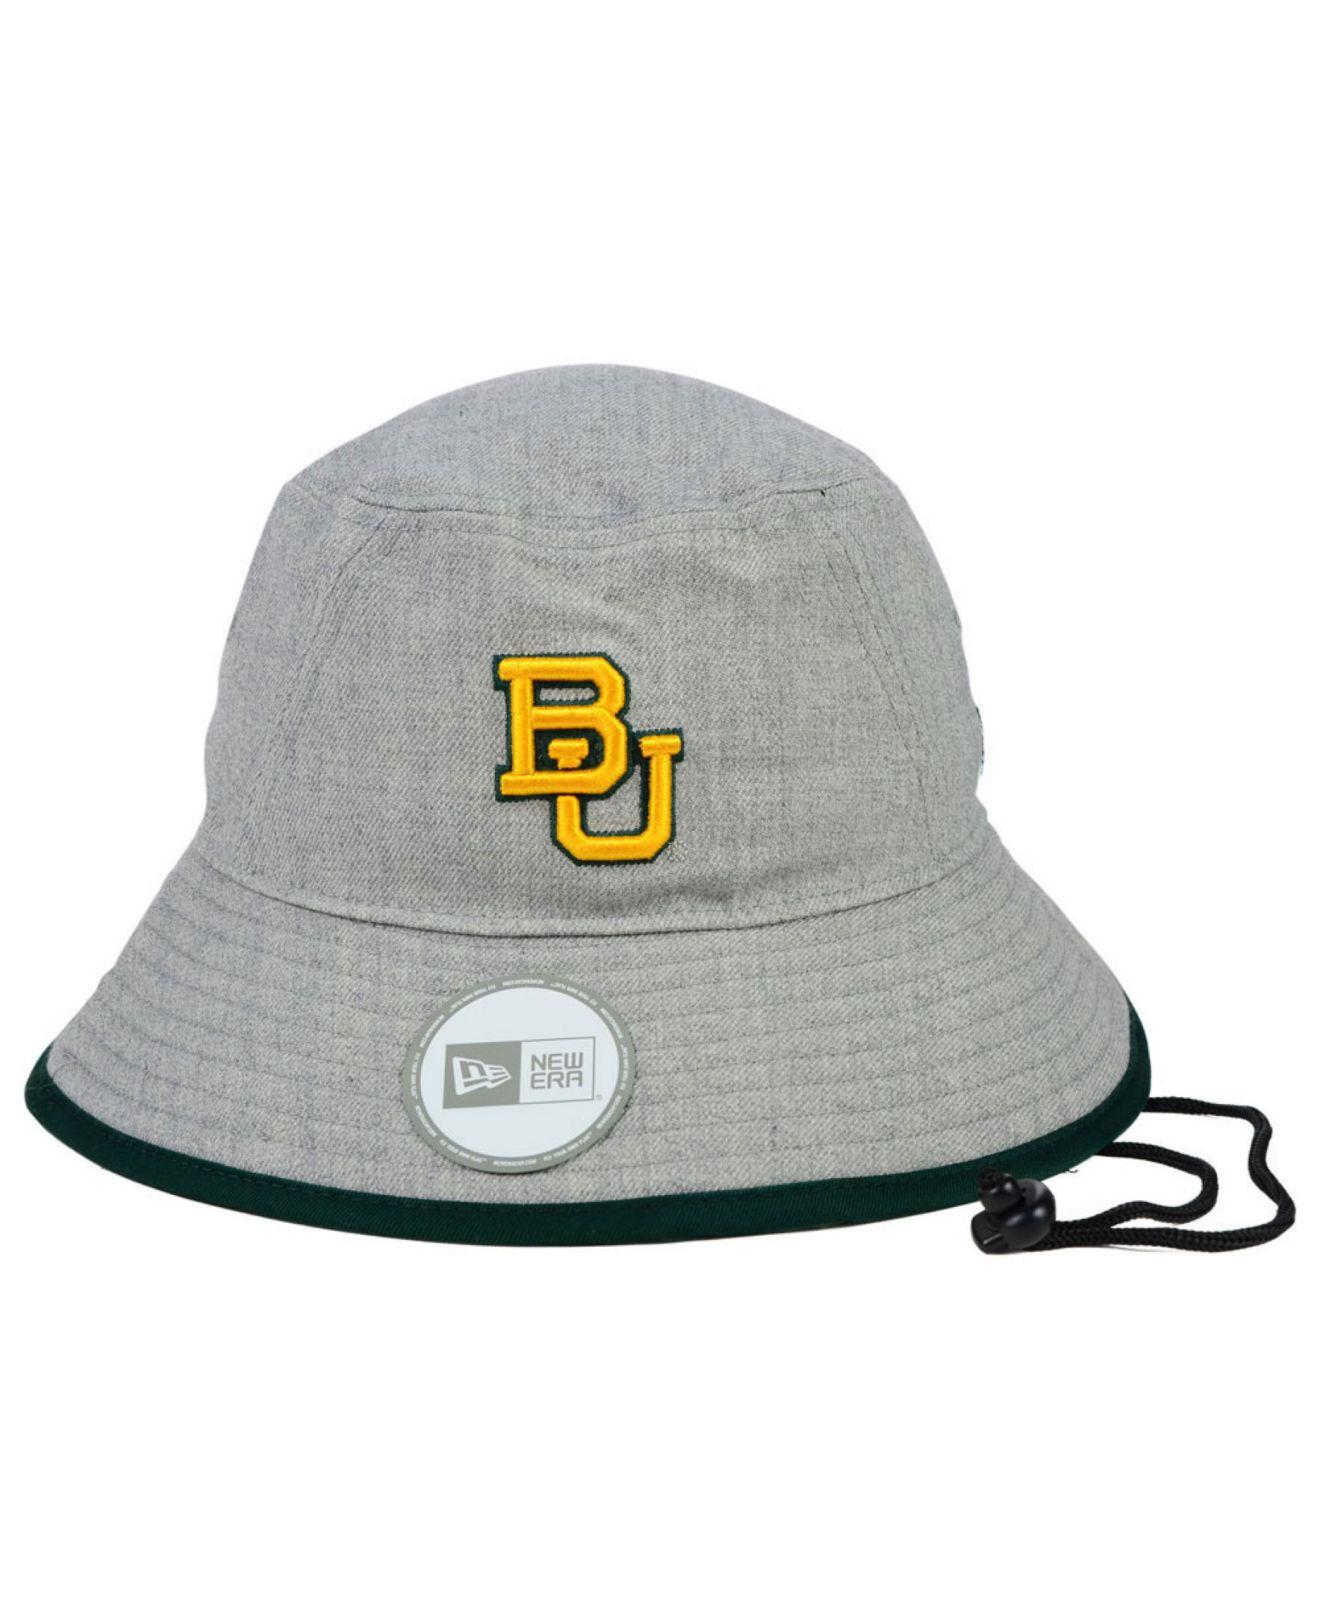 63c3b27920d Lyst - Ktz Baylor Bears Tip Bucket Hat in Gray for Men